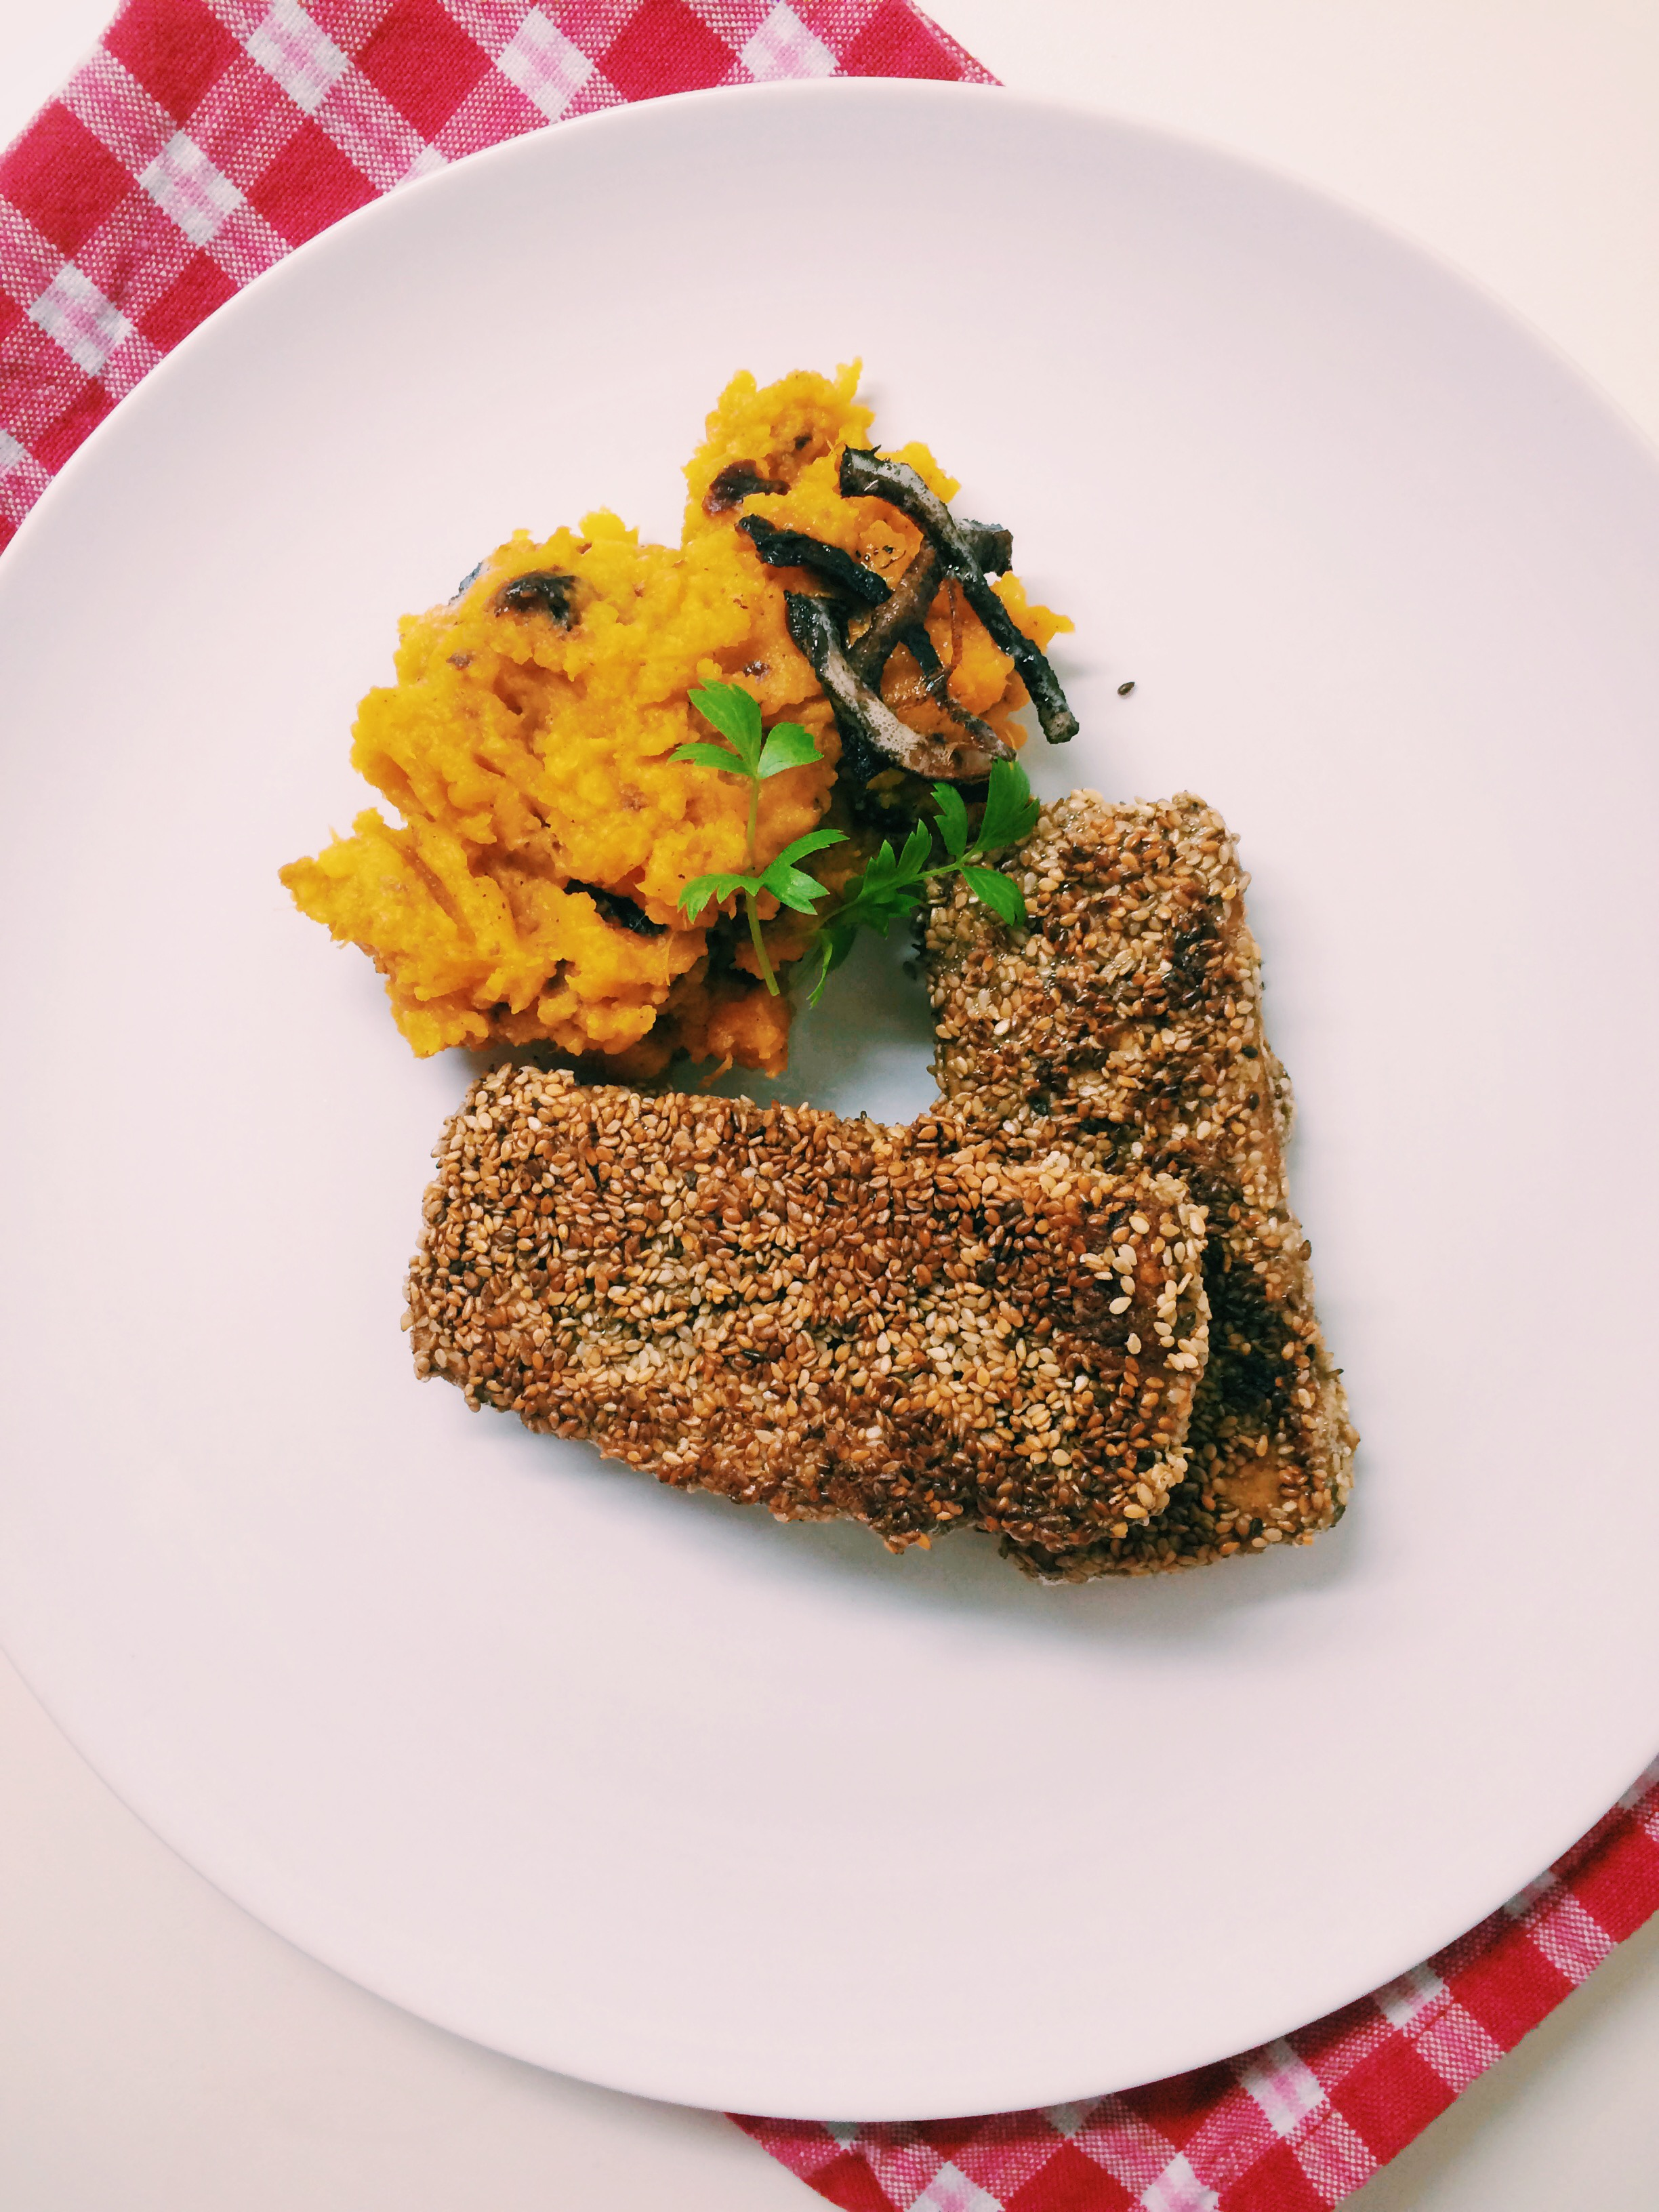 Tofu Sesam Schnitzel